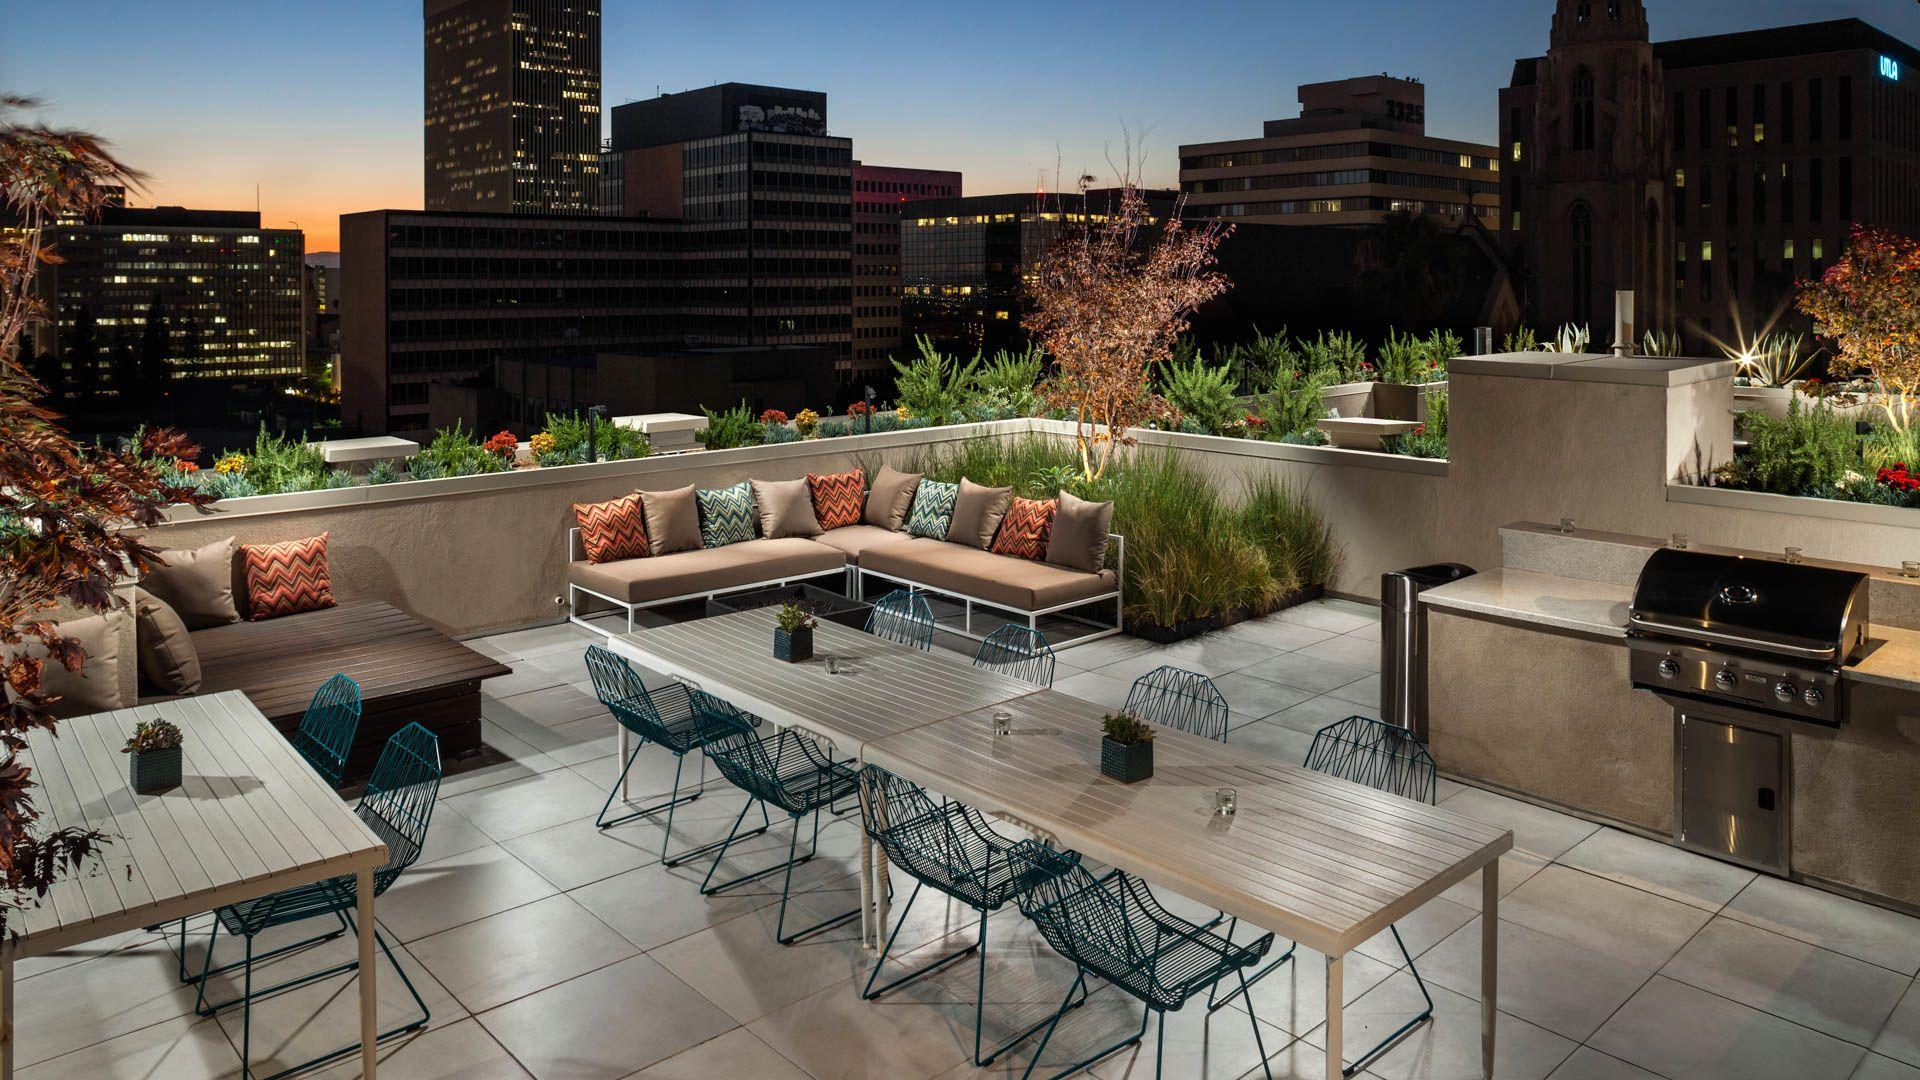 Radius Koreatown Apartments - Rooftop Lounge